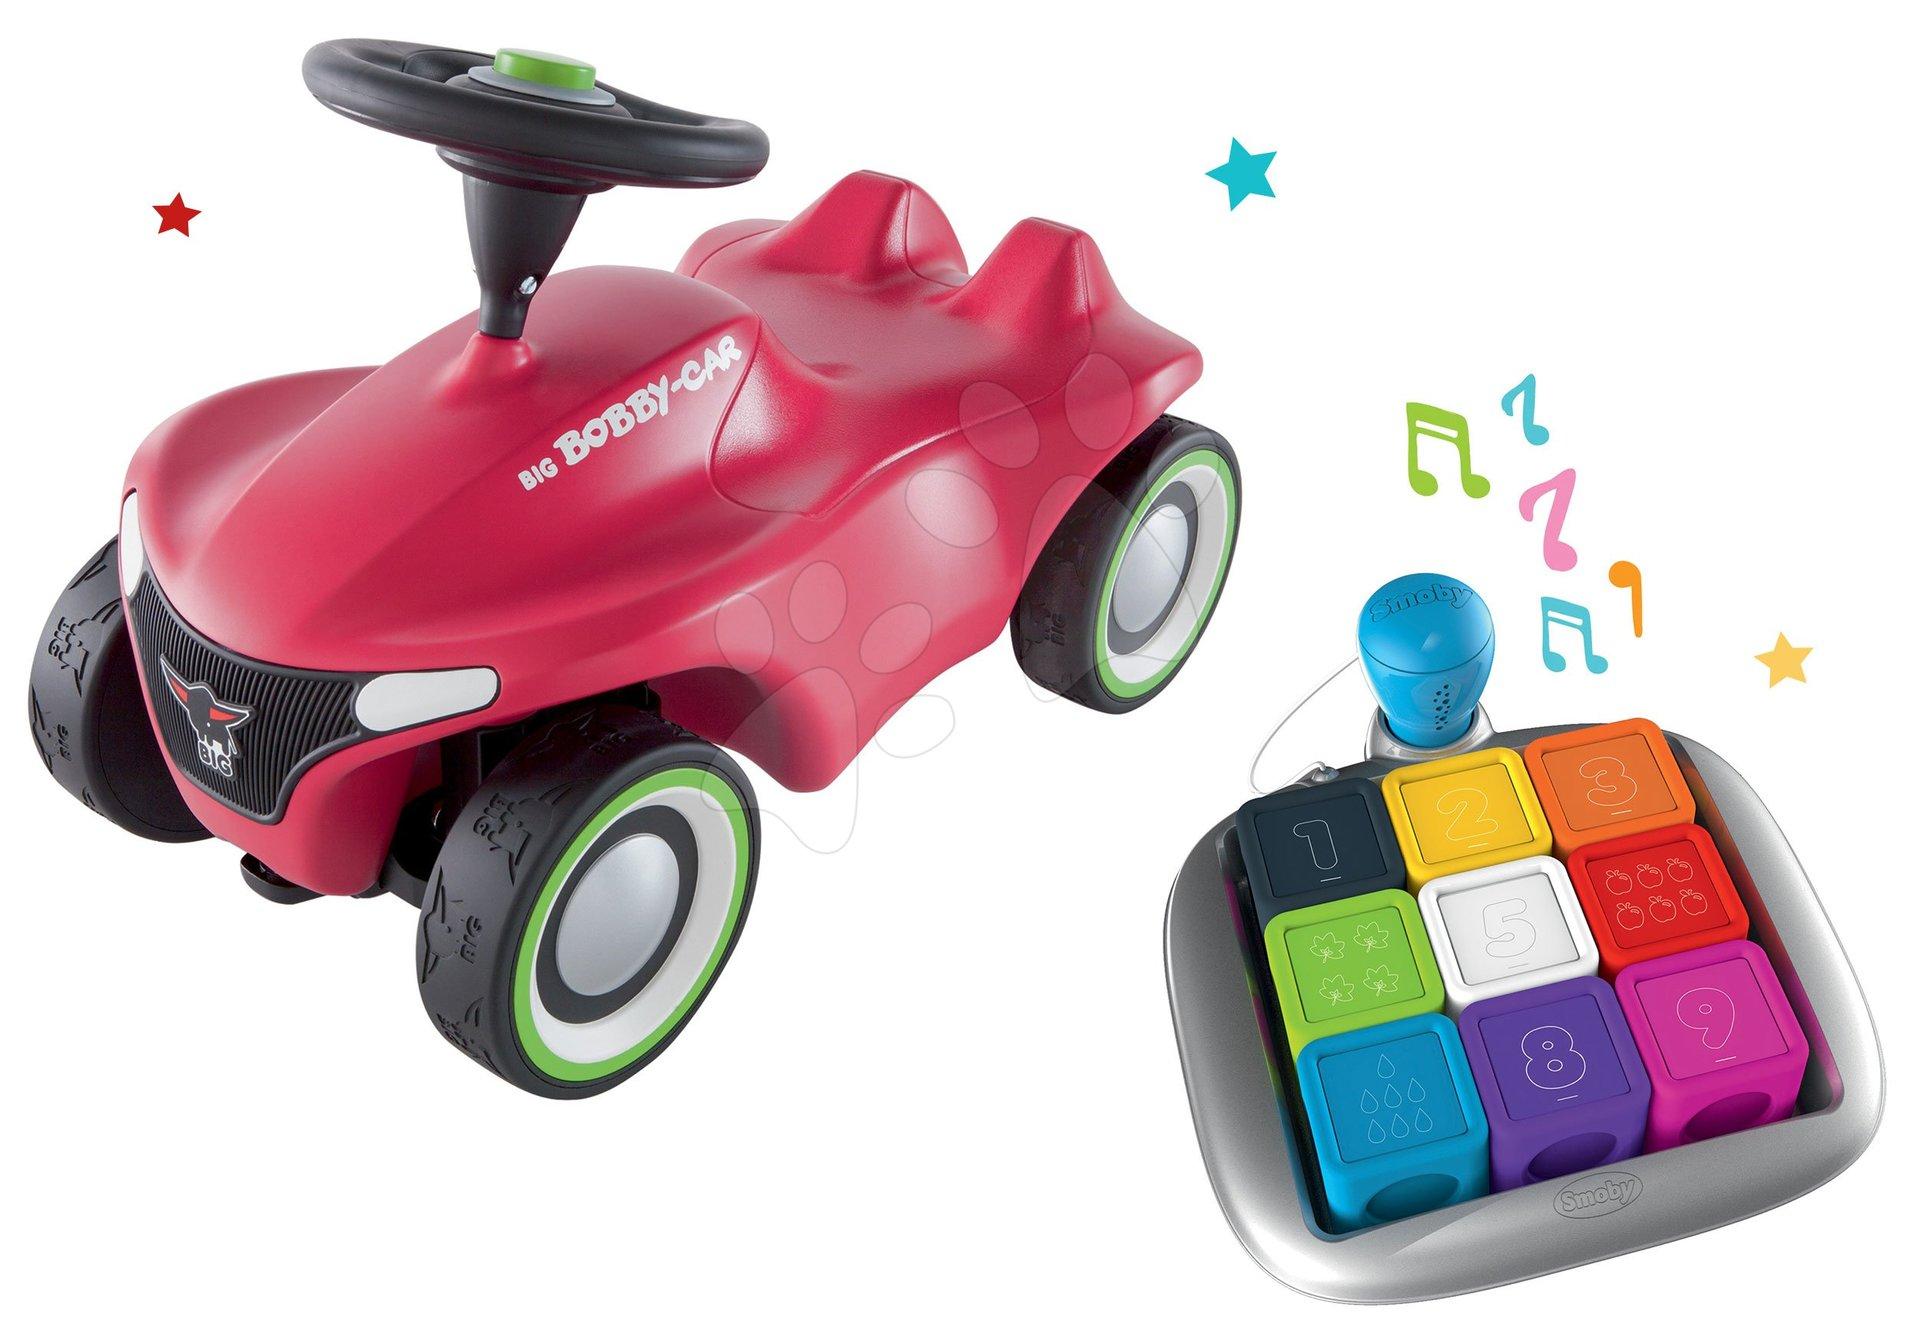 Set Interaktívna hra Clever Cubes Smart Smoby a odrážadlo auto Bobby Car Neo Pink